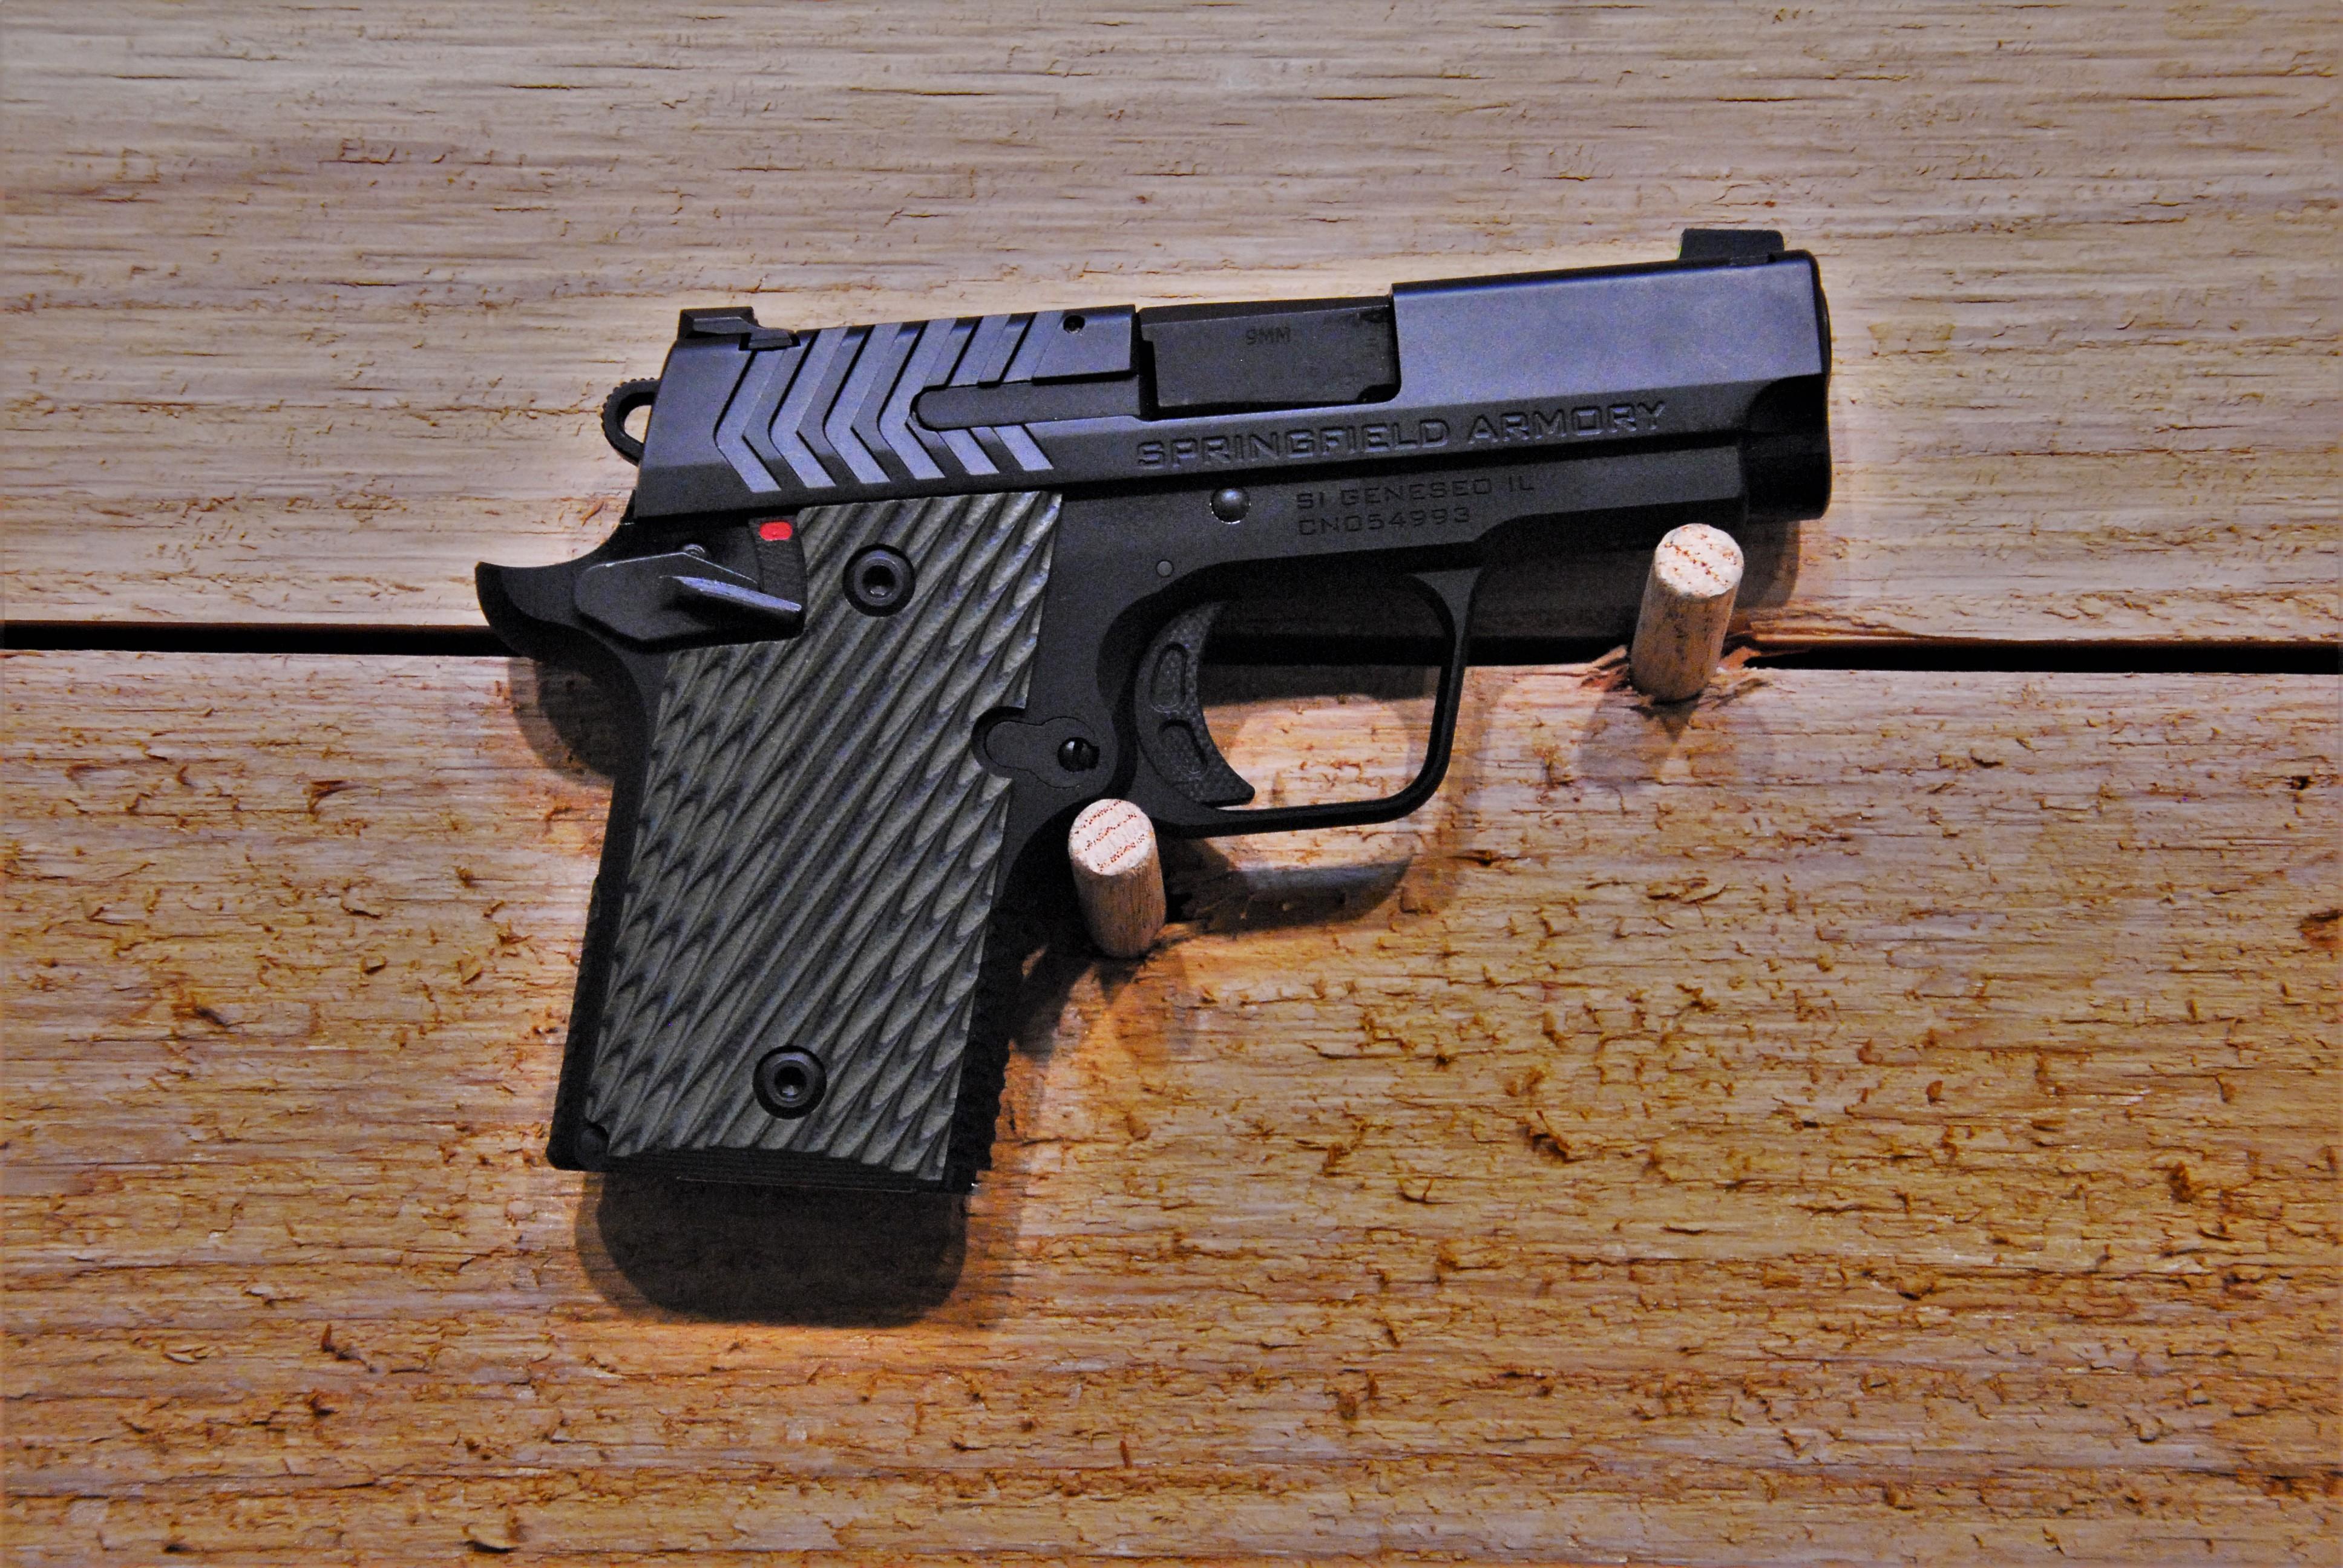 Adelbridge New & Used Pistols, Handguns, Revolvers in San